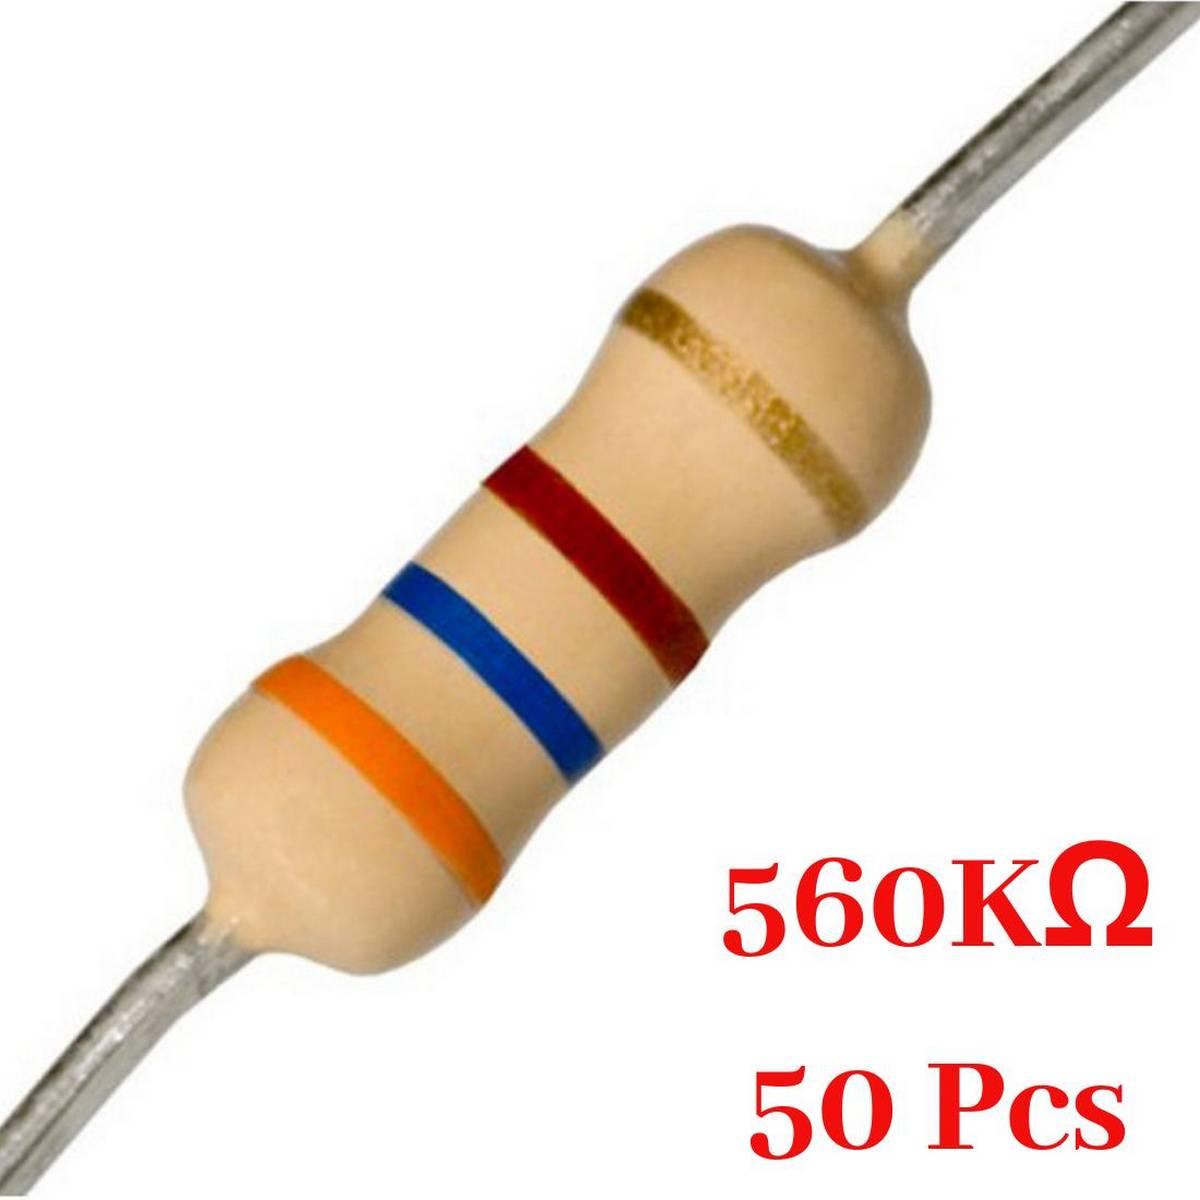 50 Pcs- 560K Ohm resistor